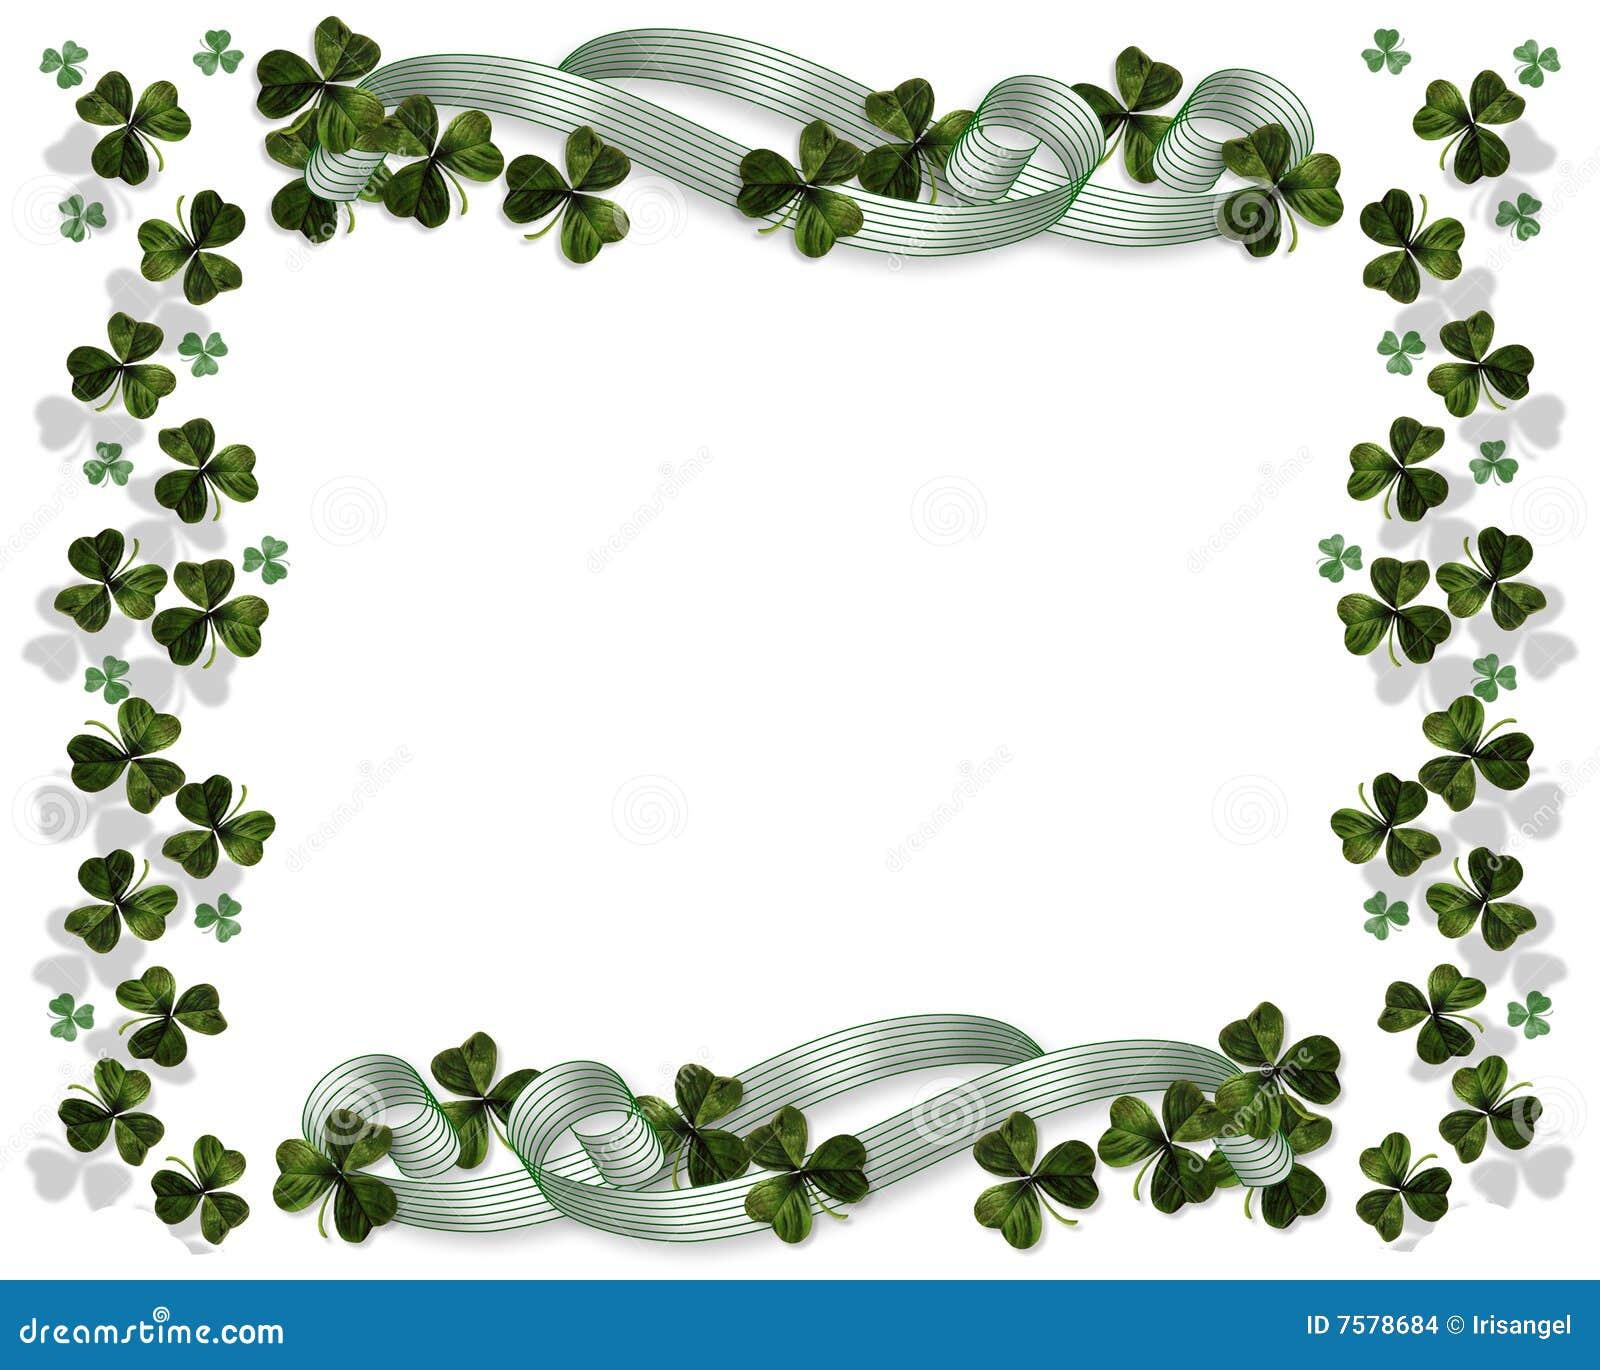 st patricks day border clipart 20 free Cliparts | Download ... |St Patricks Border